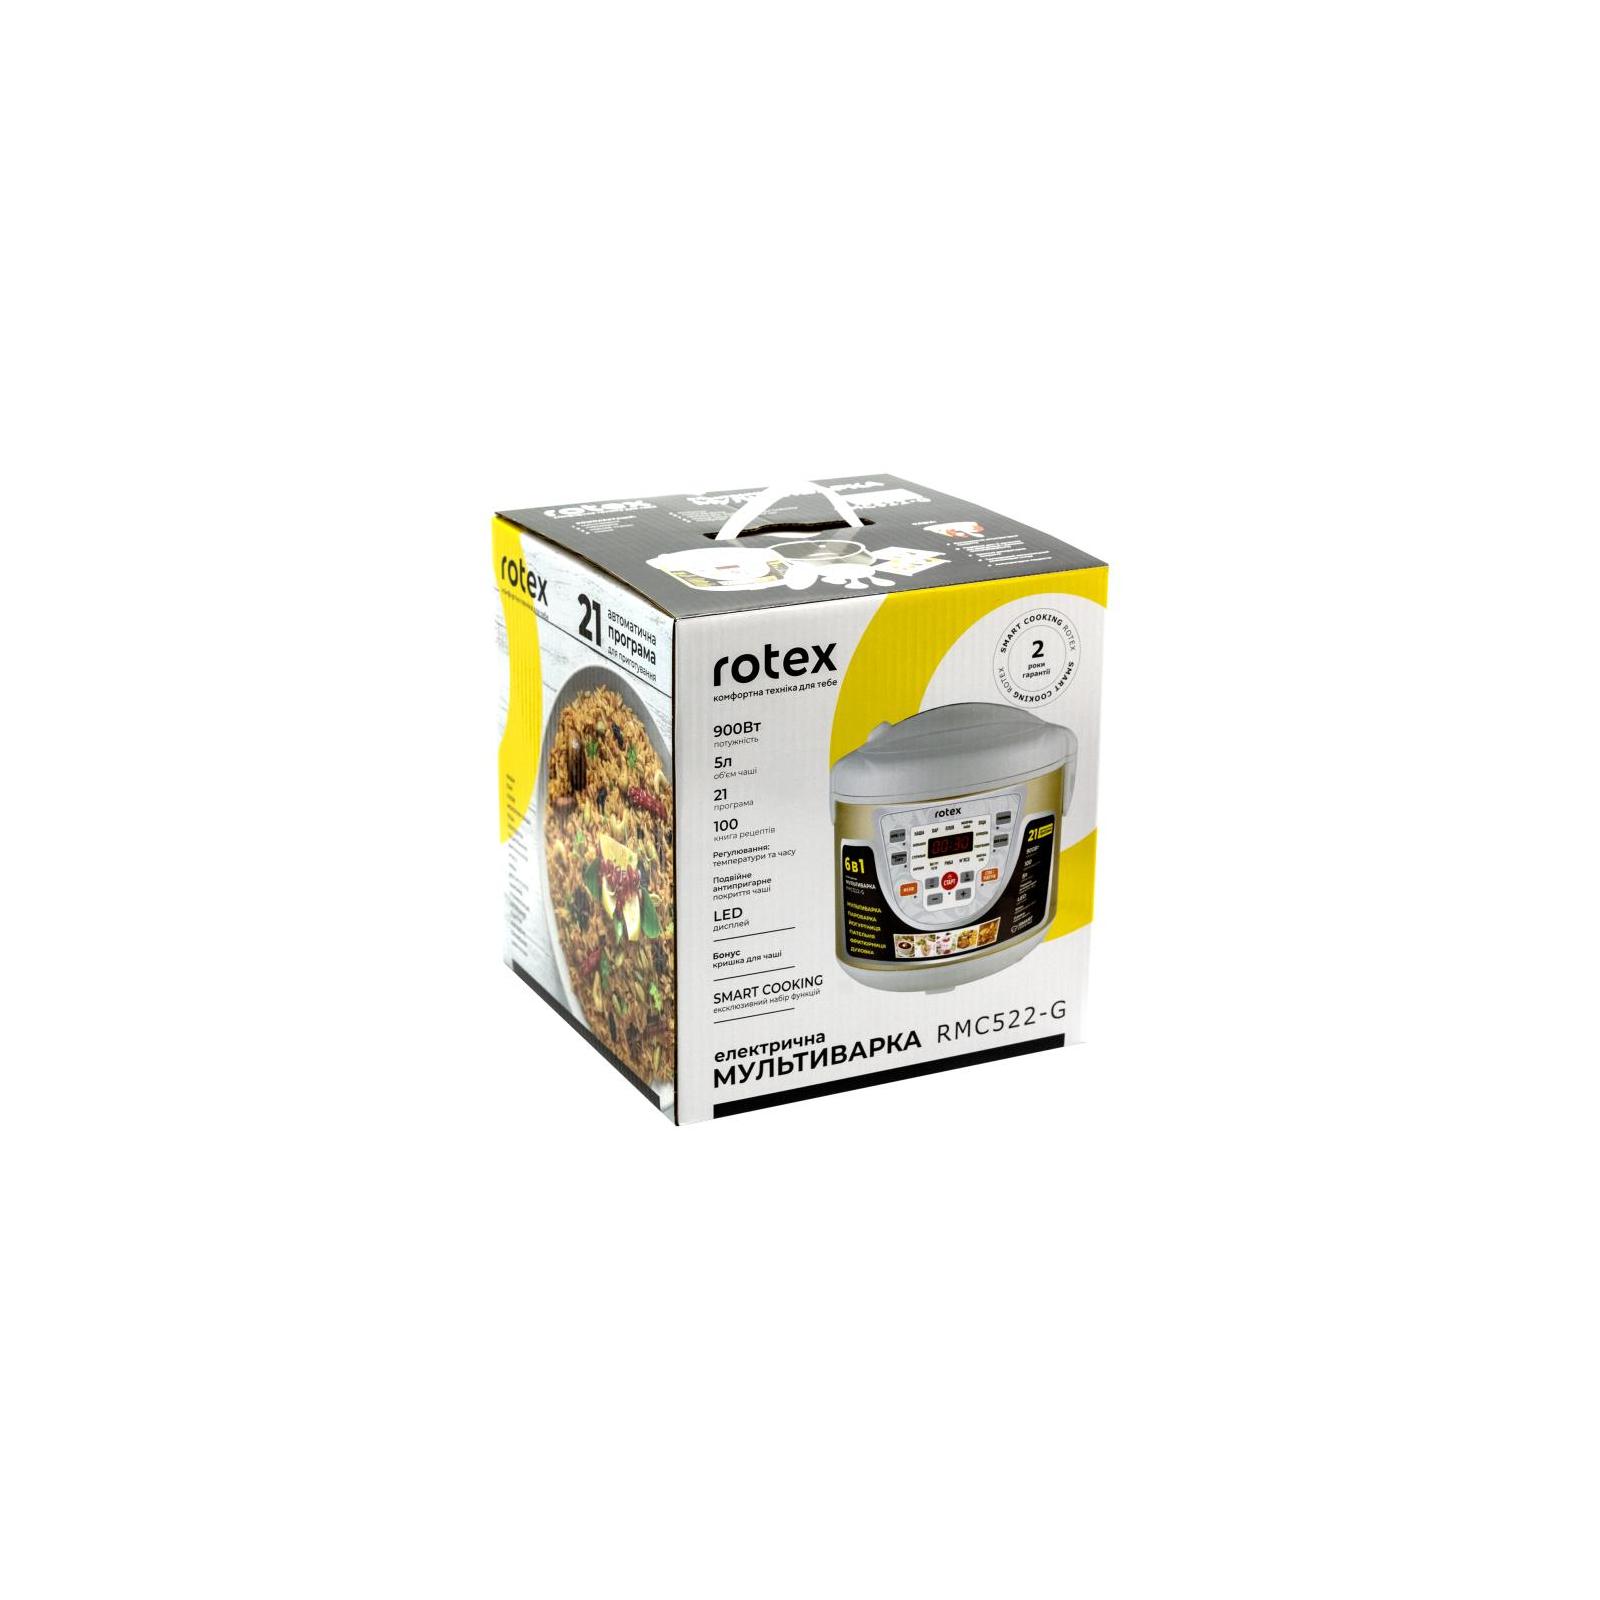 Мультиварка Rotex RMC522-G изображение 7